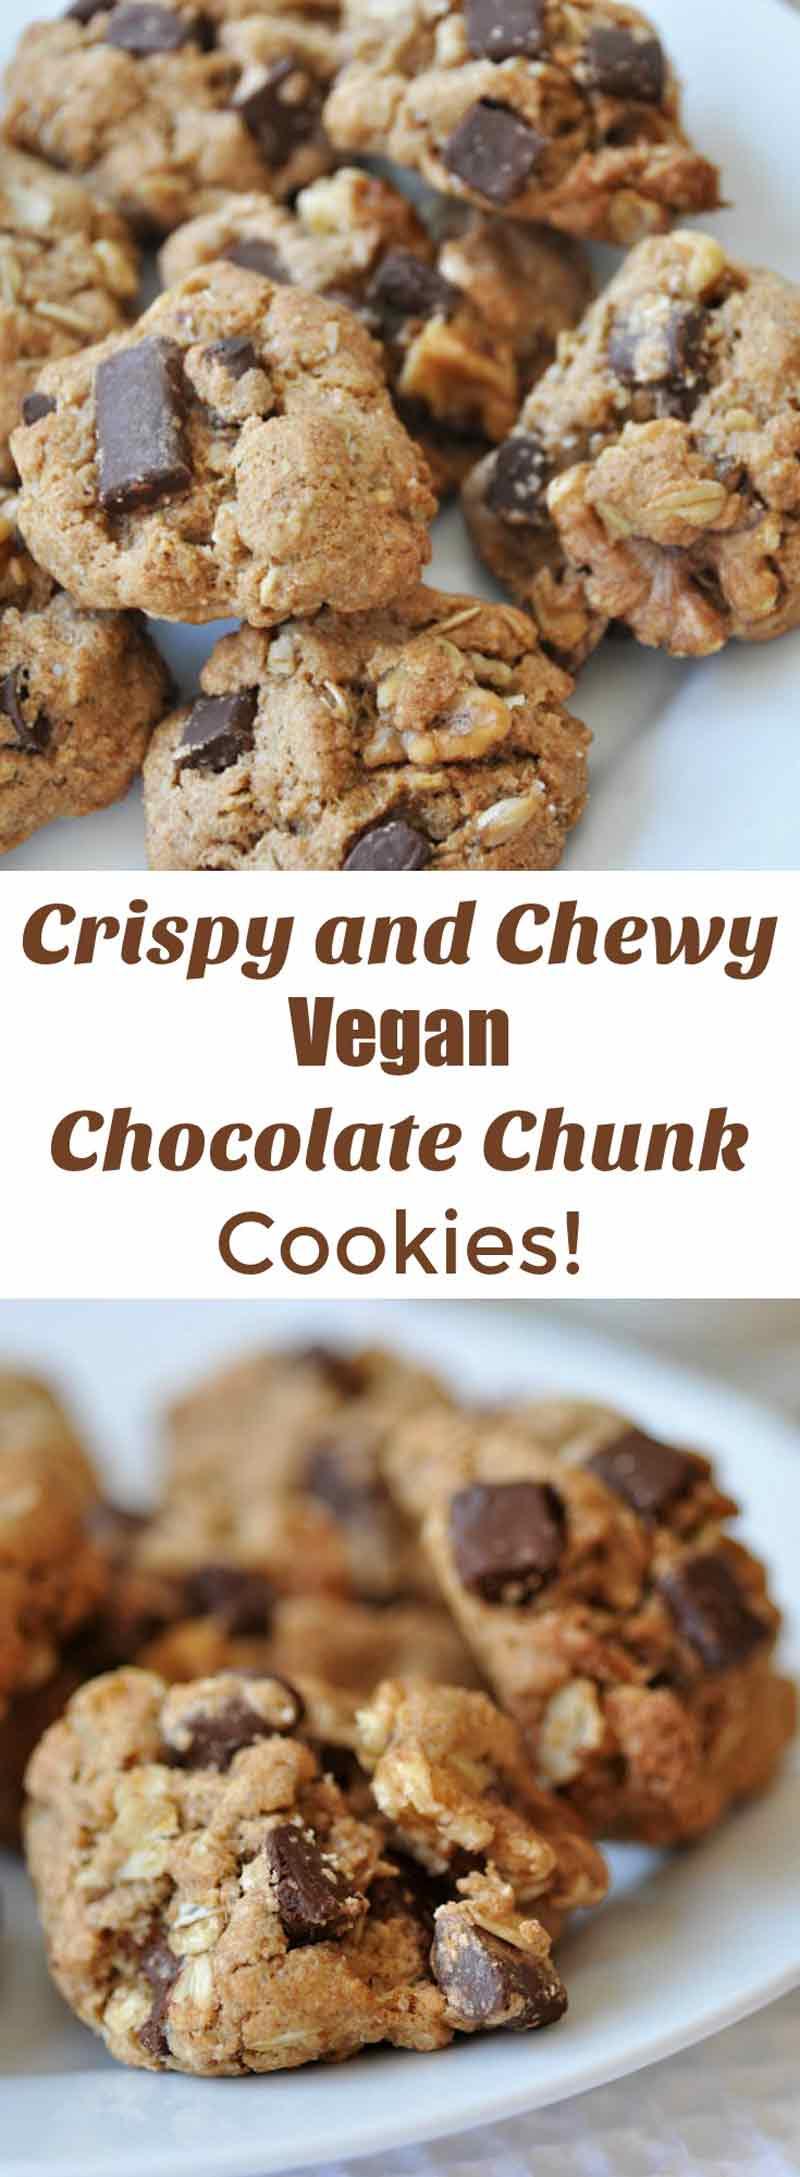 Crispy Vegan Chocolate Chunk Oatmeal Cookies - Veganosity